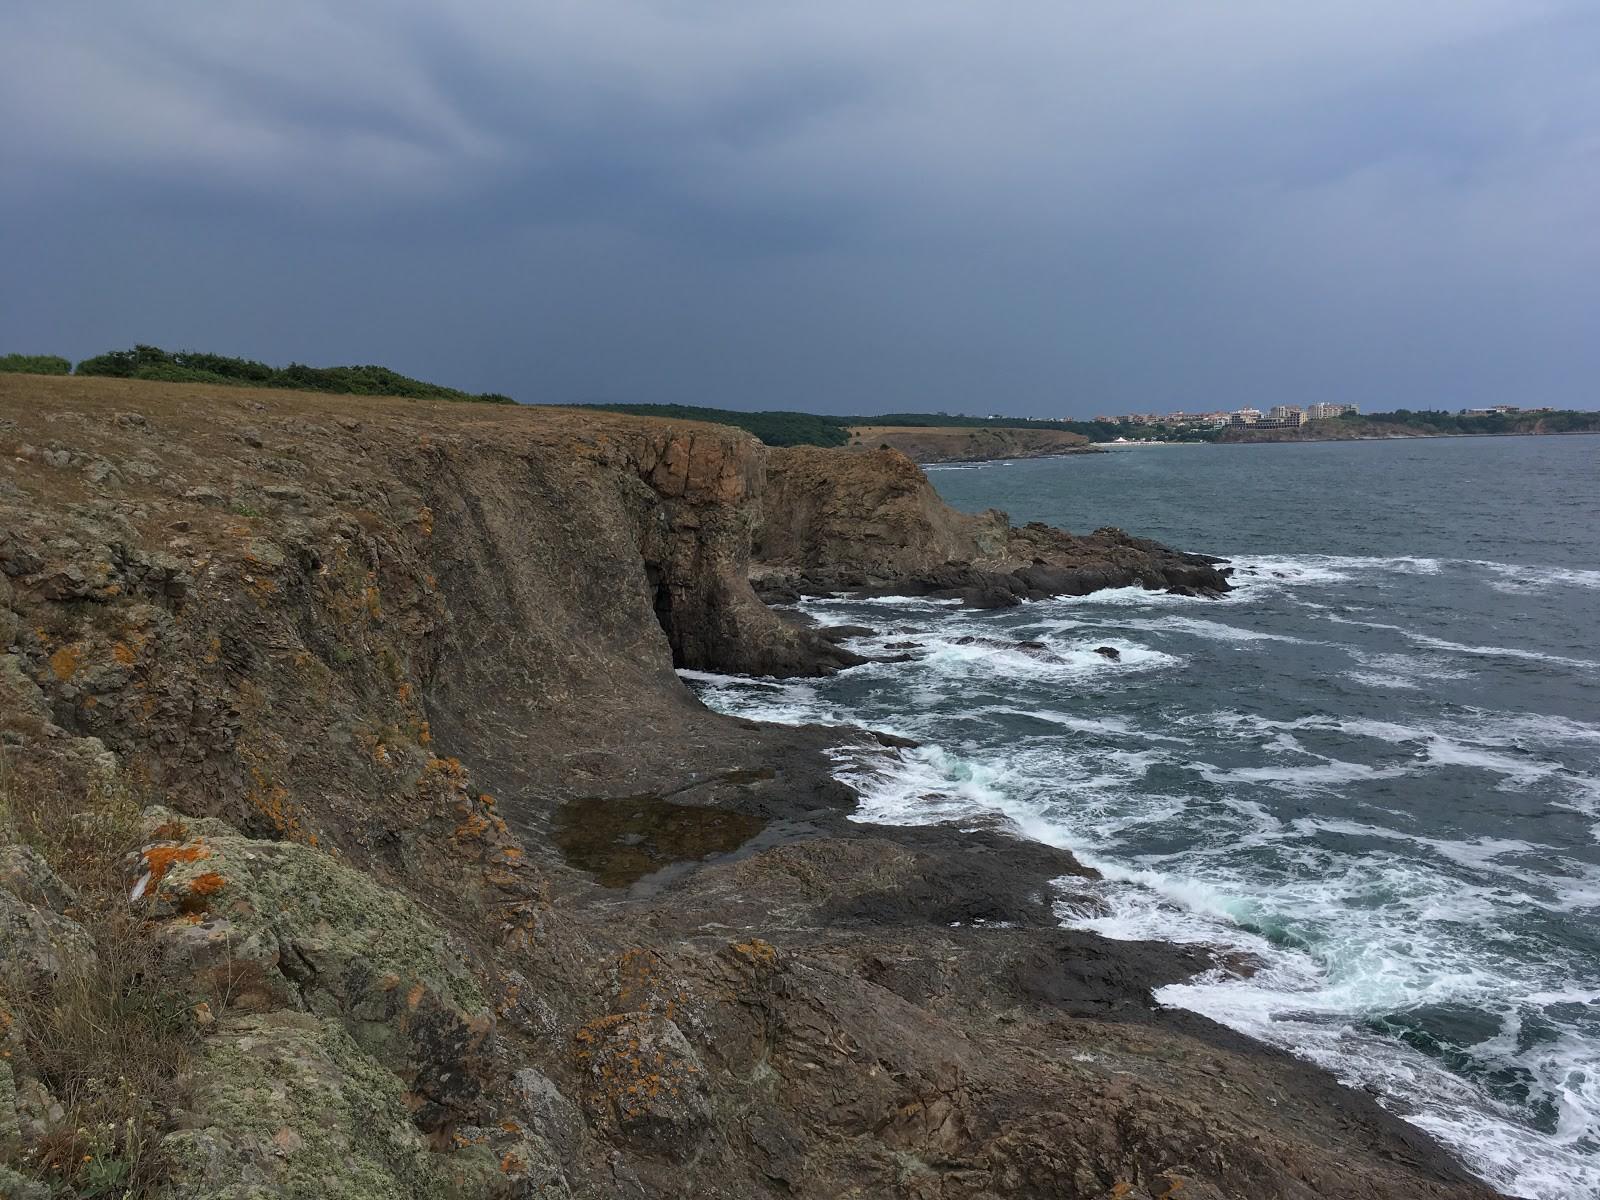 cliff edge at Sinemorets